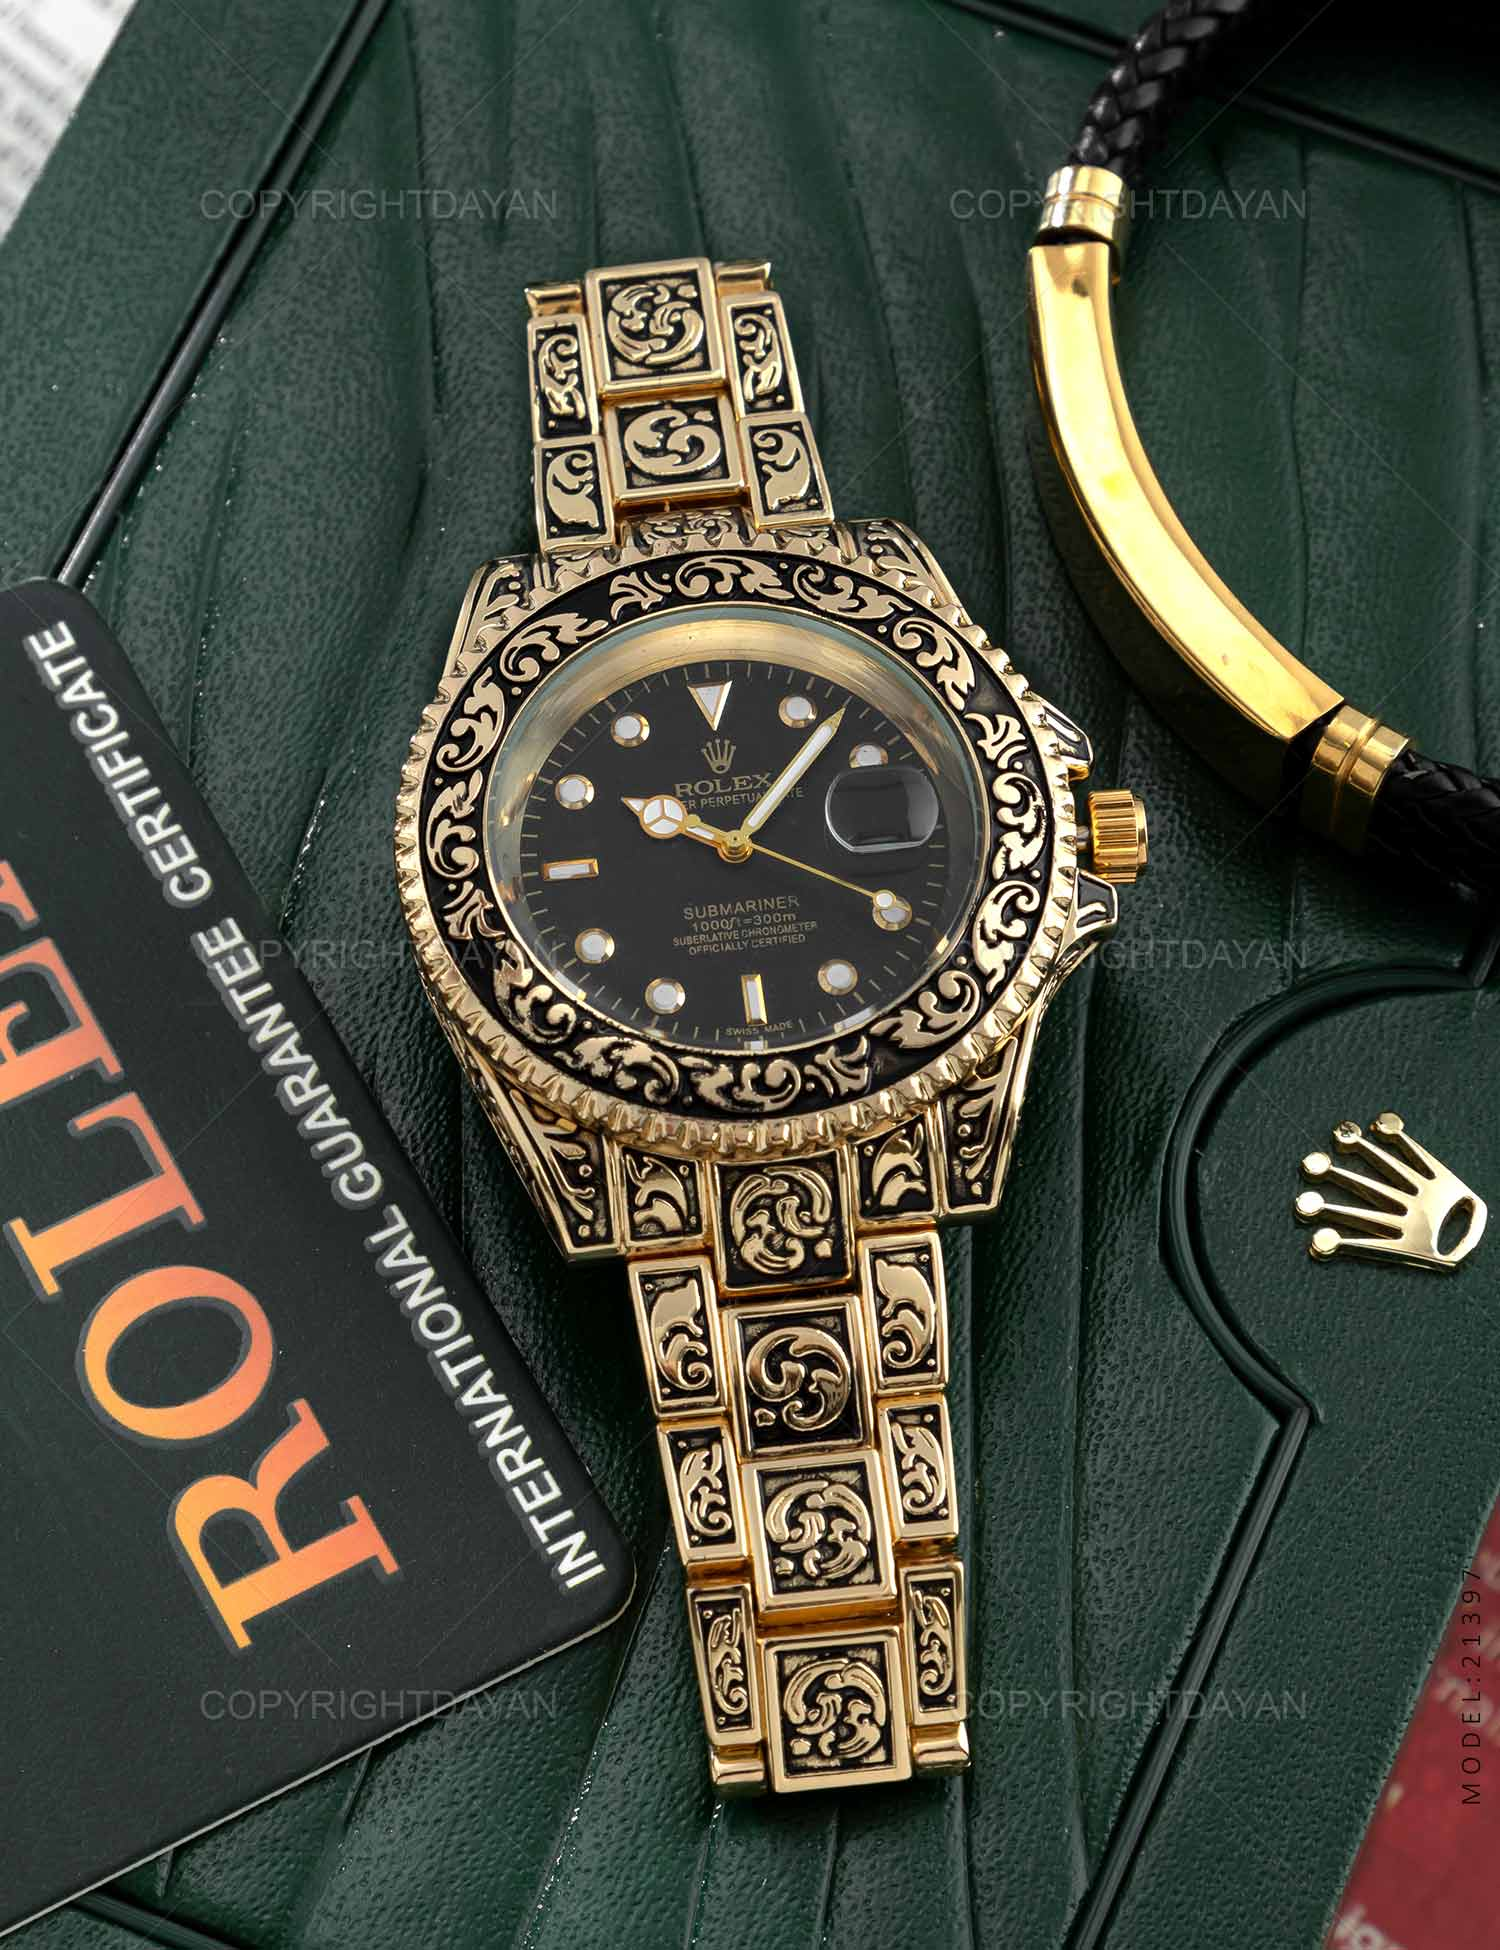 ساعت مچی Rolex مدل 21397 ساعت مچی Rolex مدل 21397 239,000 تومان